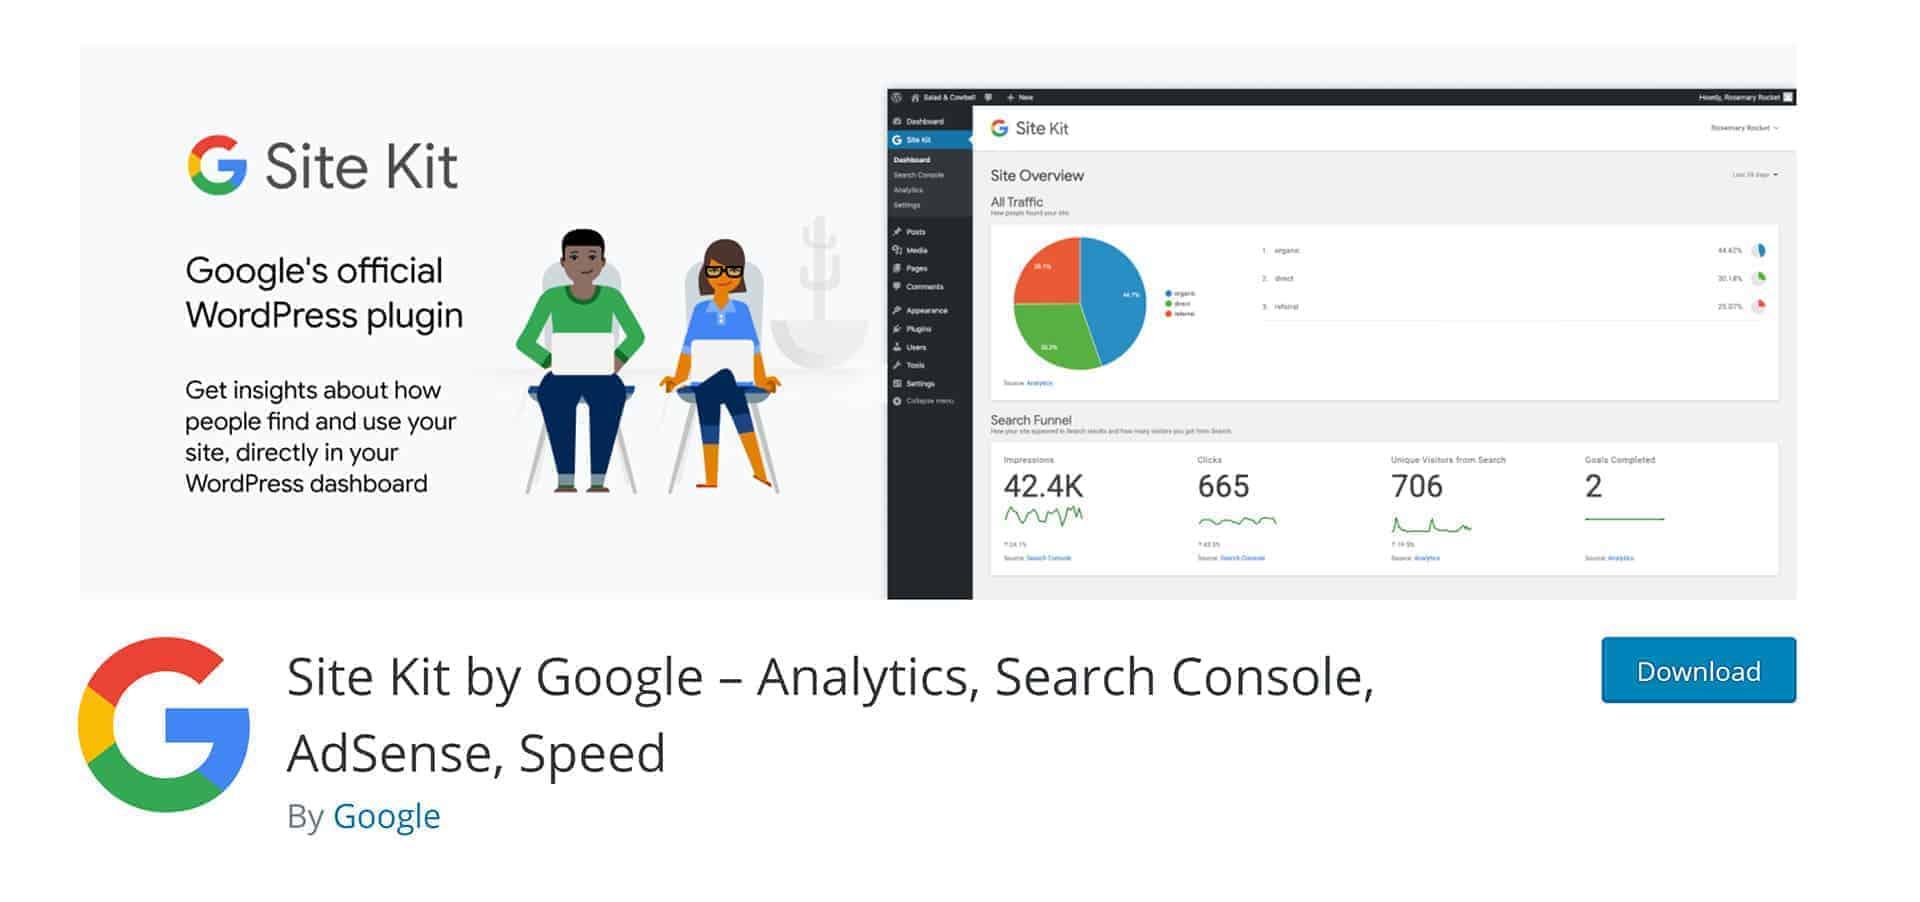 Google Site Kit plugin vincula Google Analytics y WordPress, ademñás de otras herramientas.